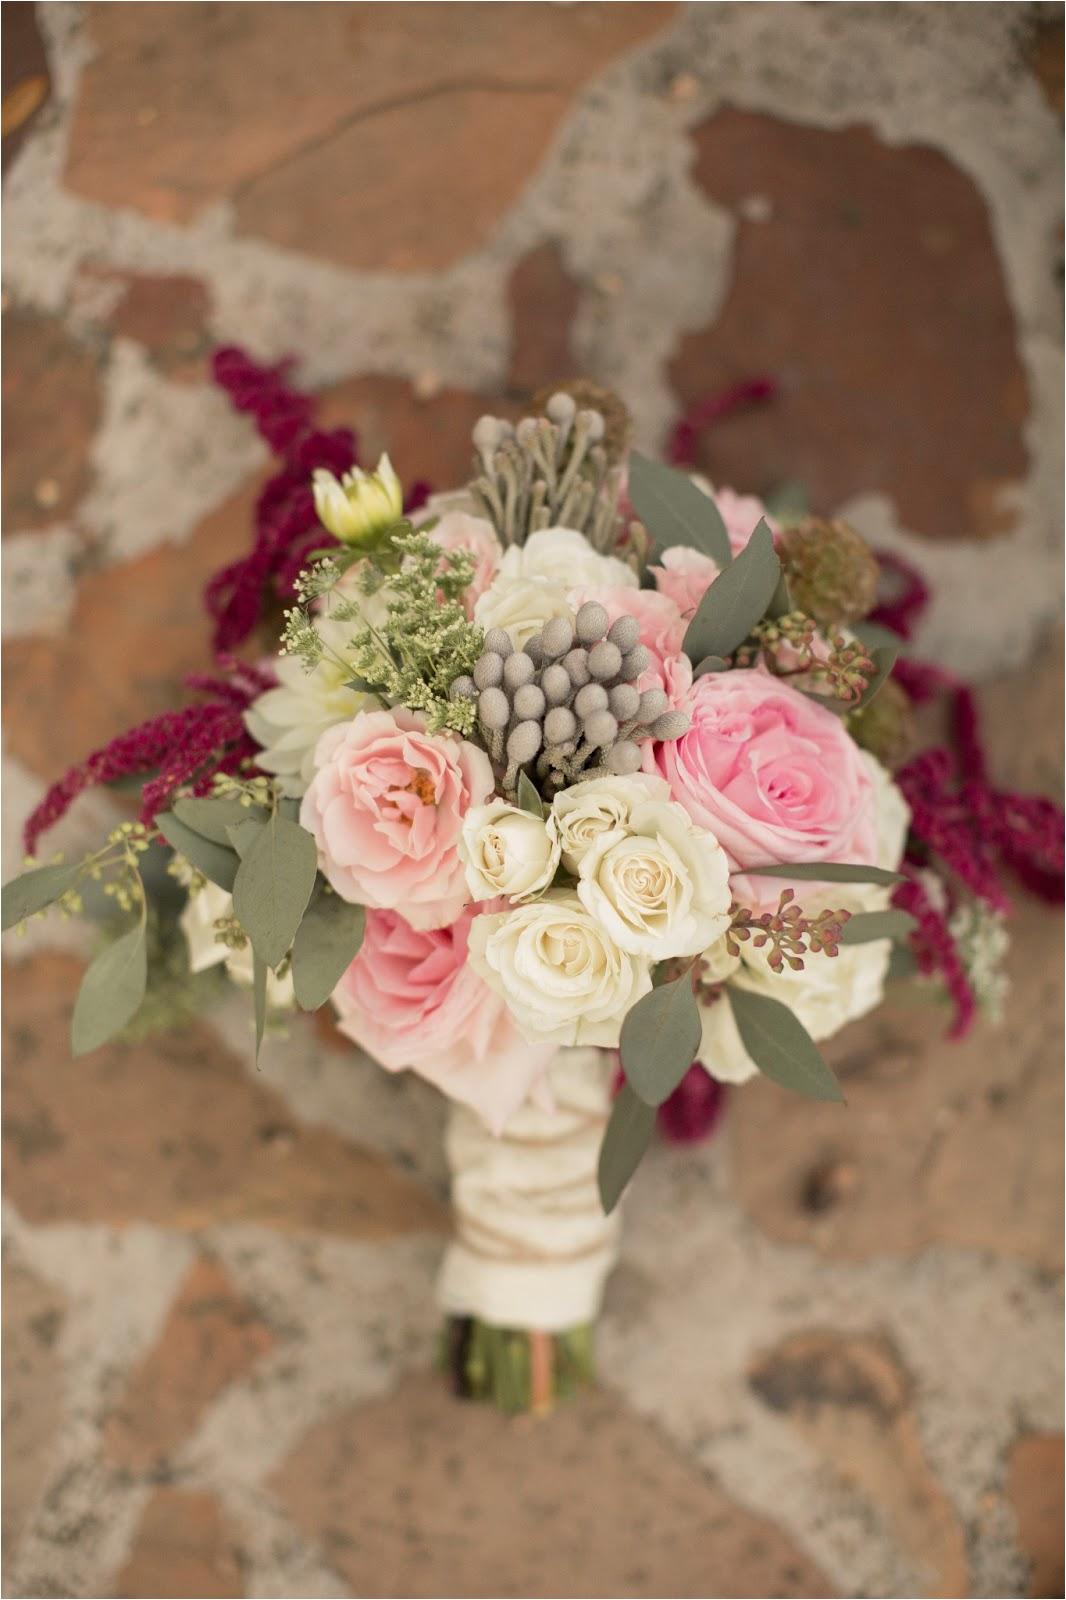 wegmans wedding flowers cost photo - 1